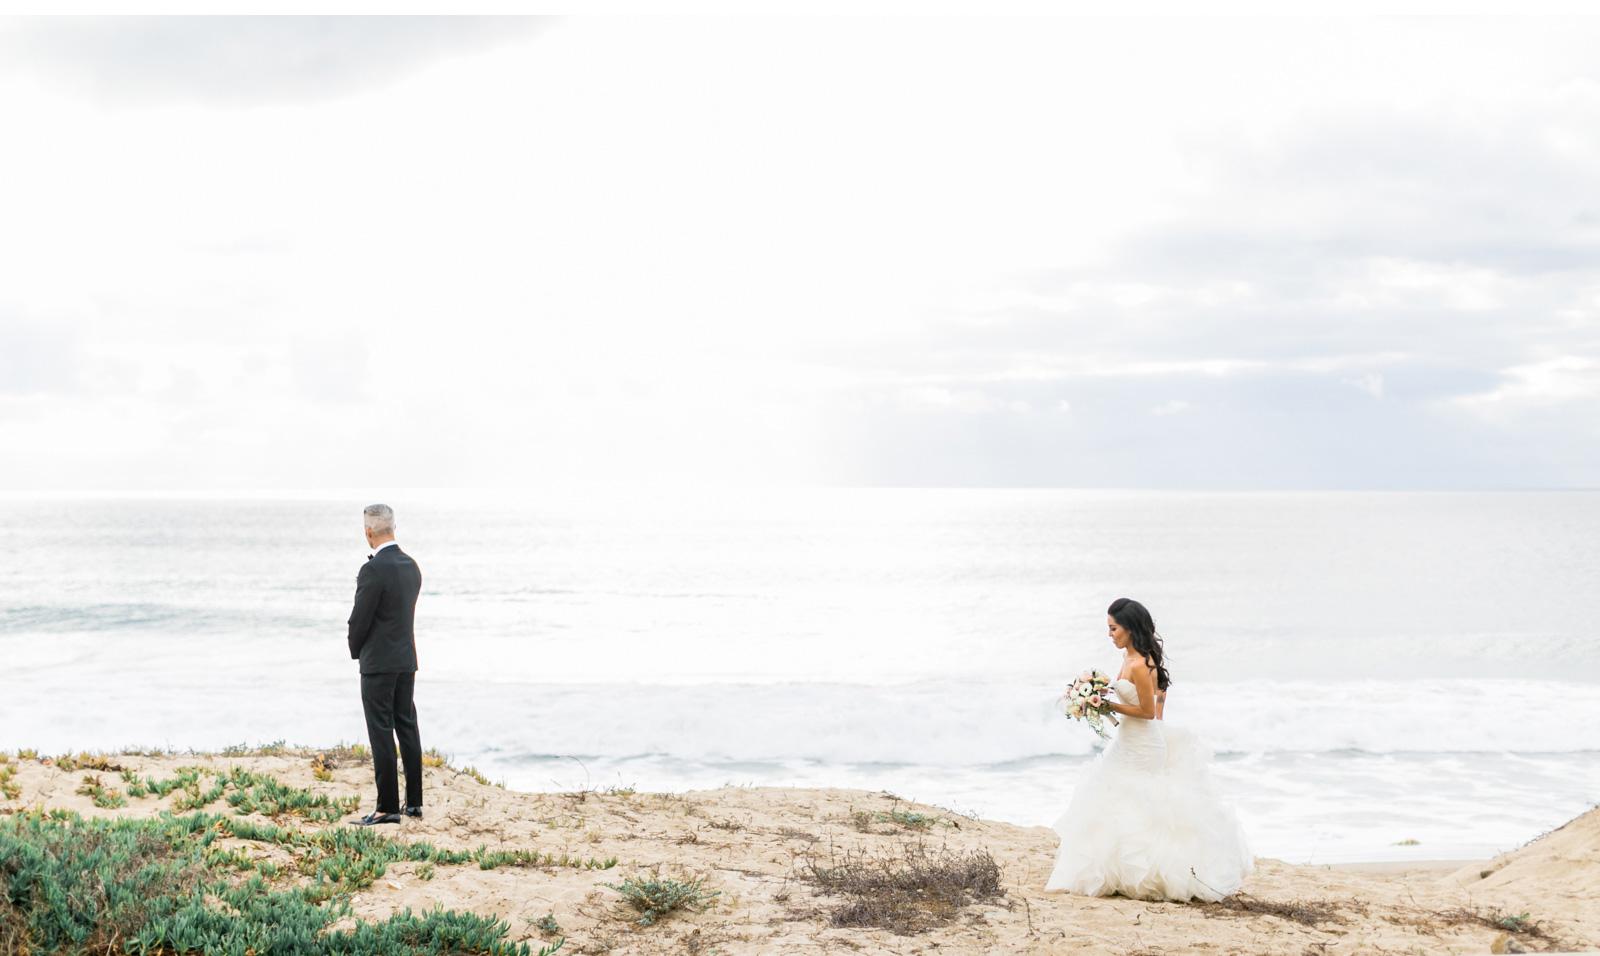 Malibu-First-Look-Natalie-Schutt-Photography-Rod-Brewster_06.jpg